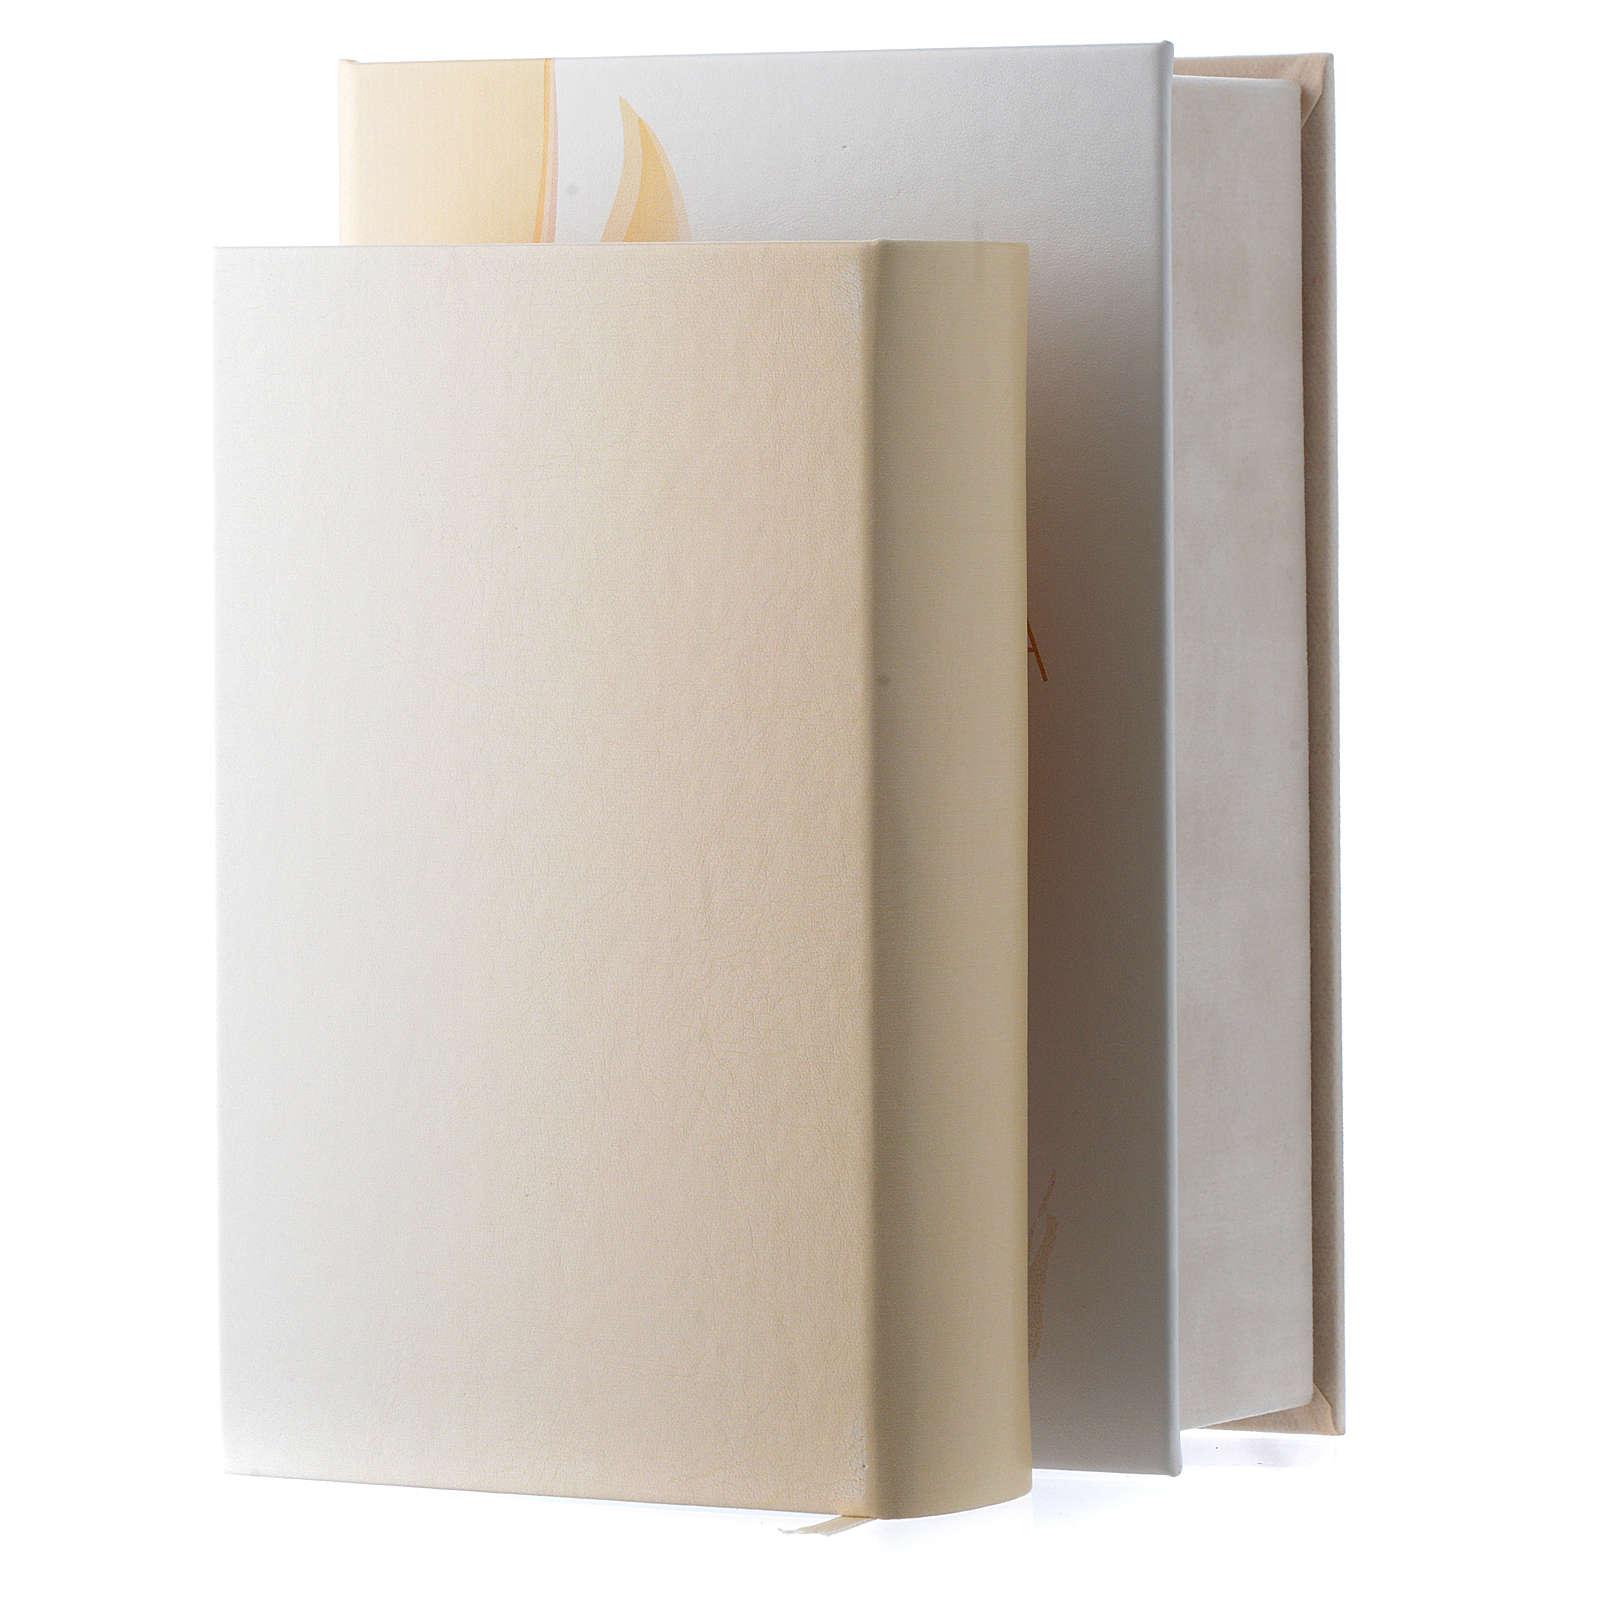 Biblia en ITALIANO de simil cuero imagen Sagrada Familia de bilaminado plata 3